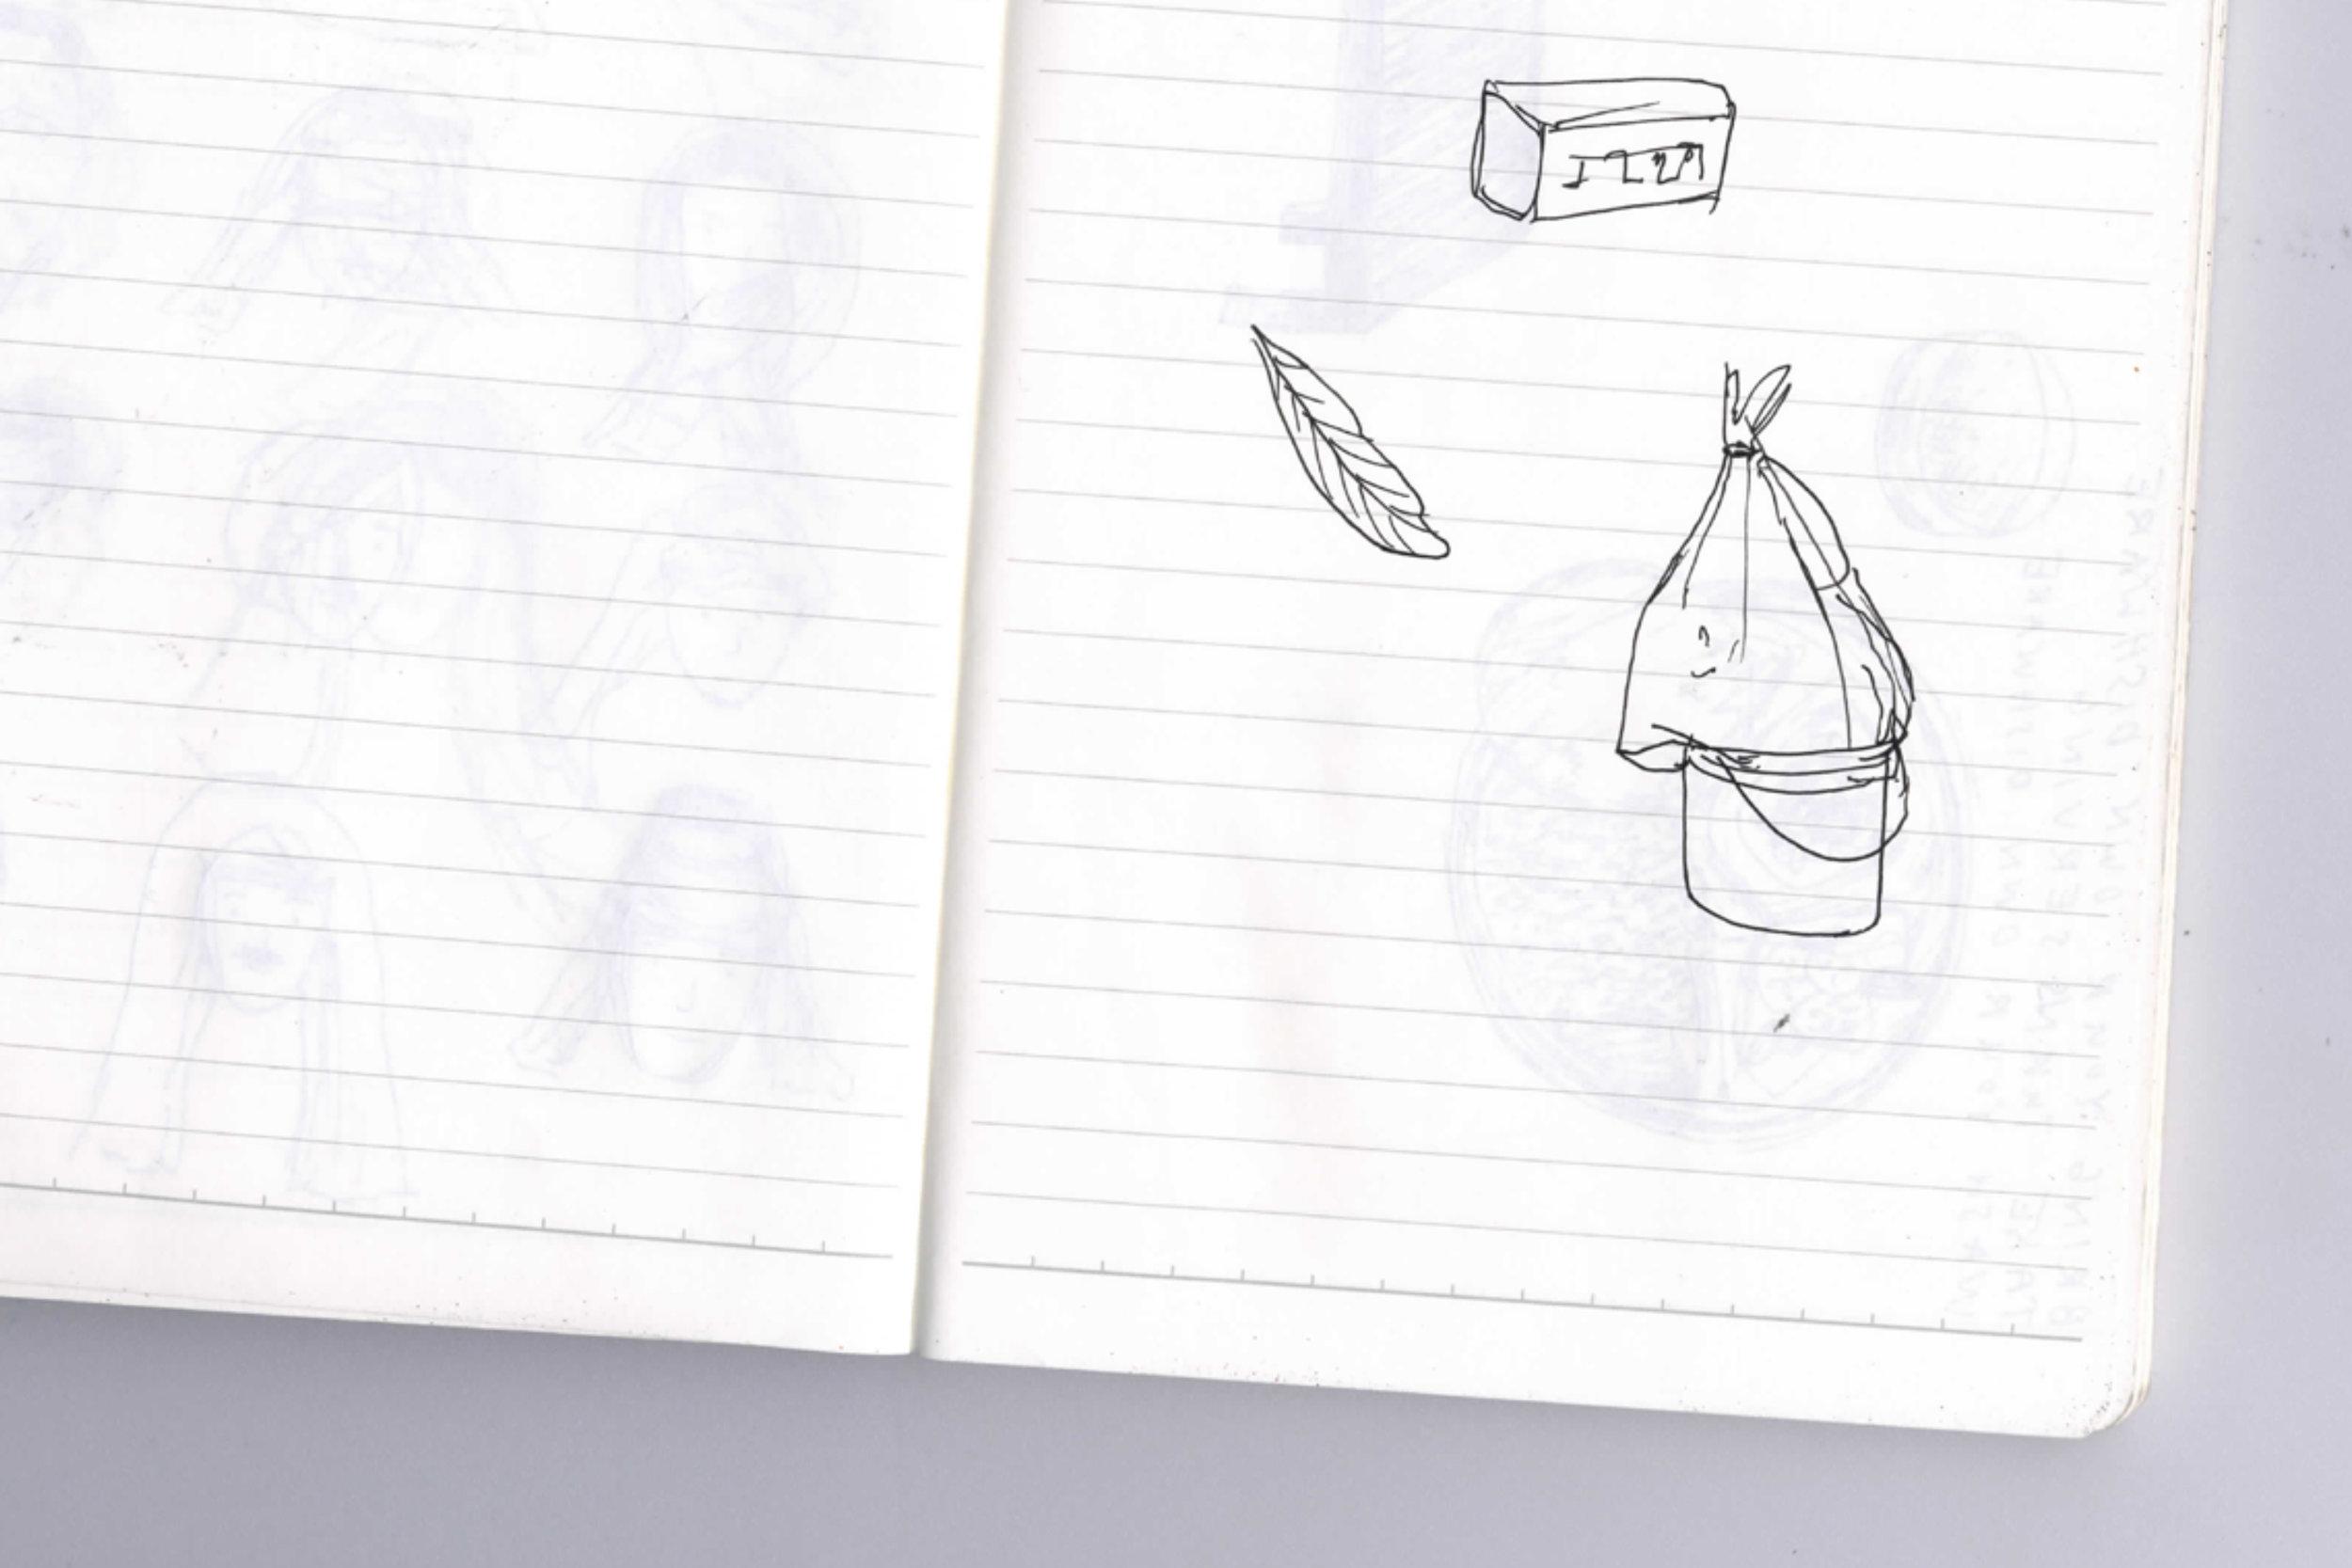 India_Sketches11.jpg